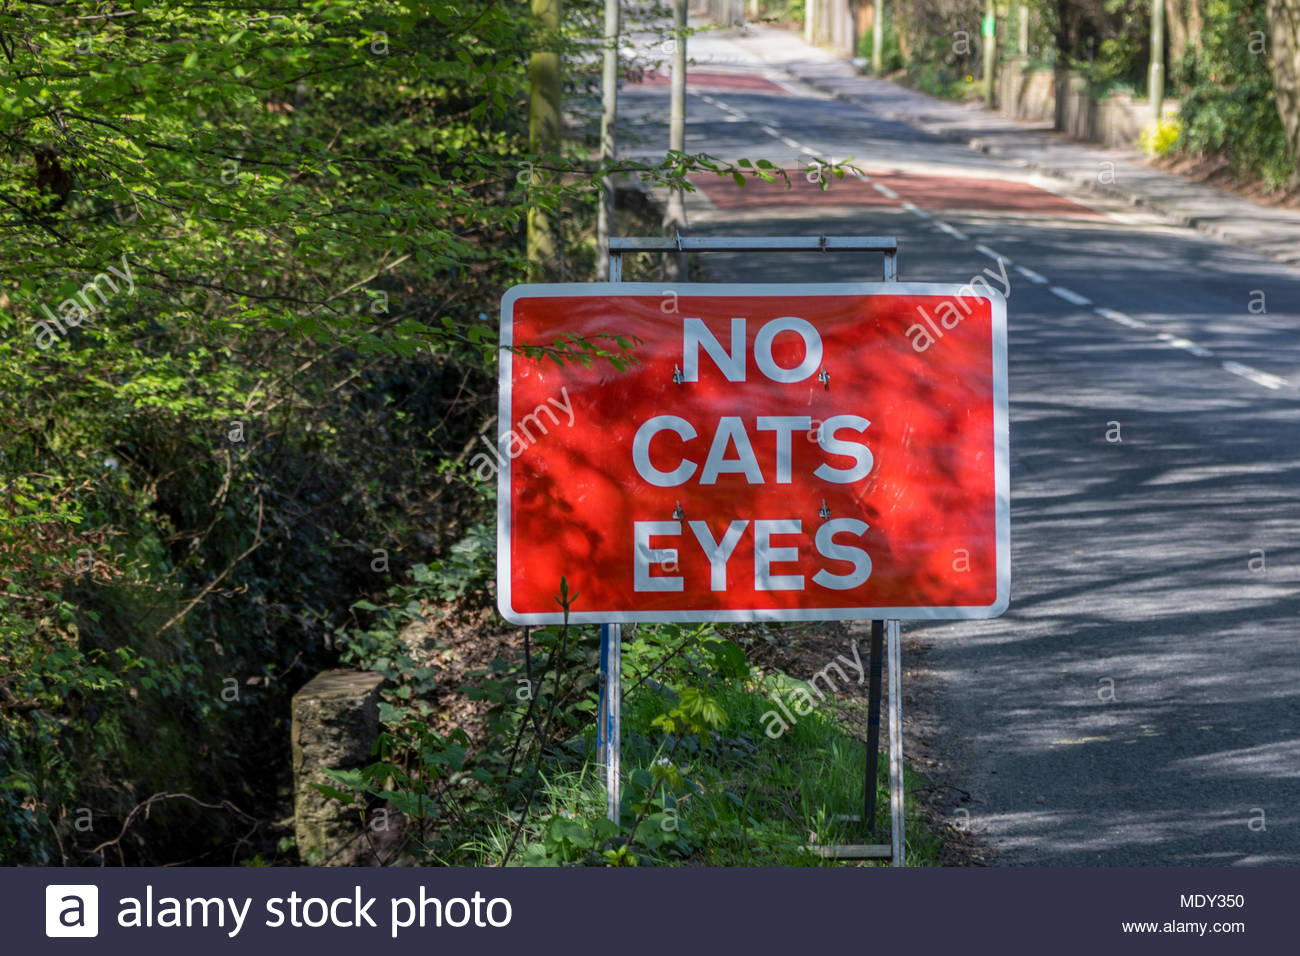 Ambiguous roadsign 'no cats eyes' - Stock Image